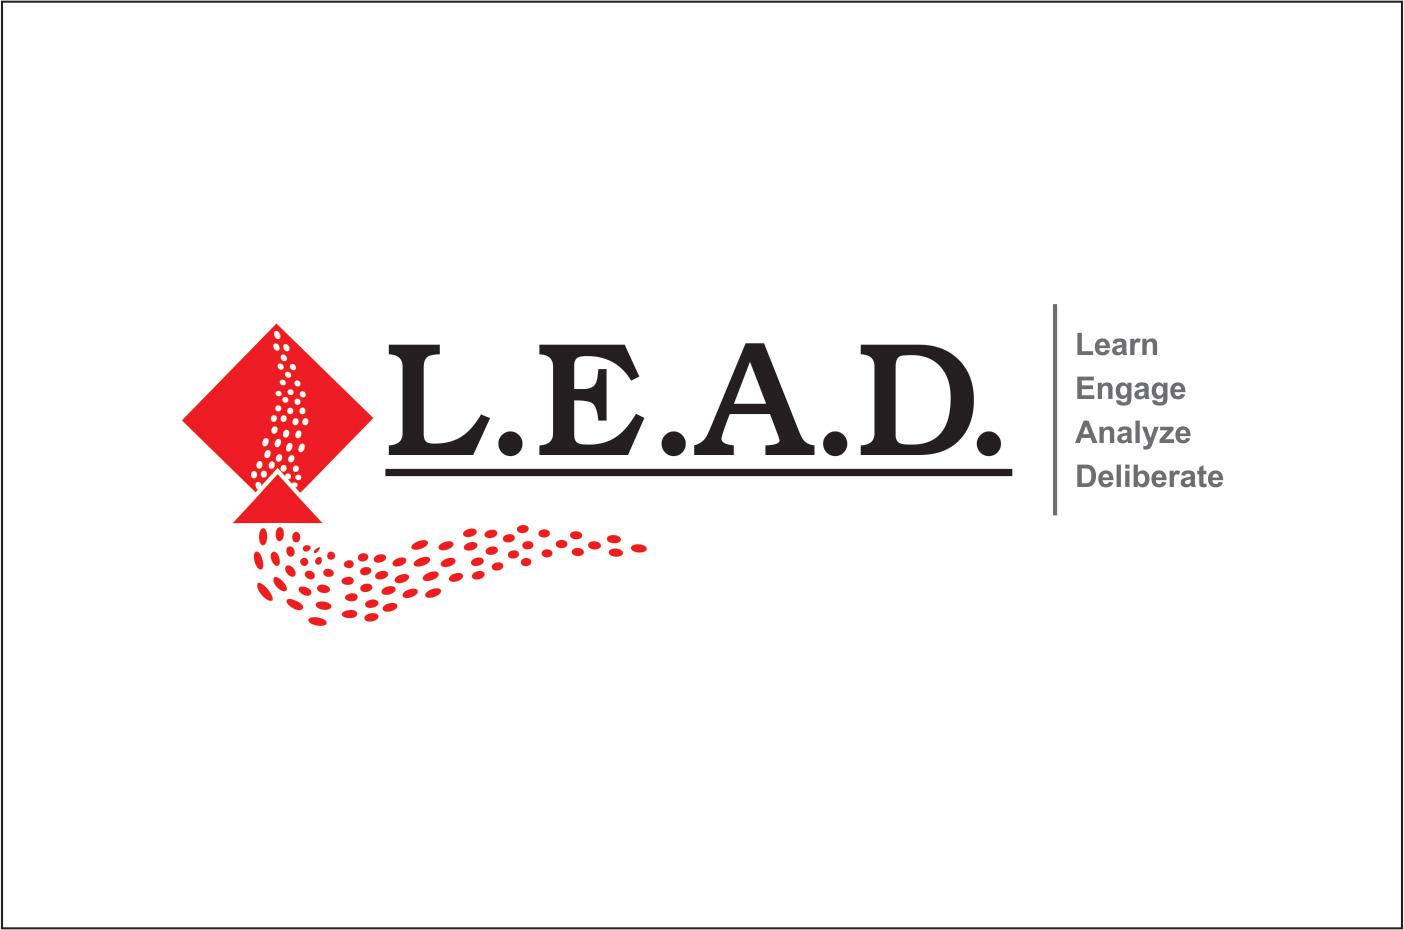 Logo Design by Rai - Entry No. 42 in the Logo Design Contest L.E.A.D. (learn, engage, analyze, deliberate) Logo Design.